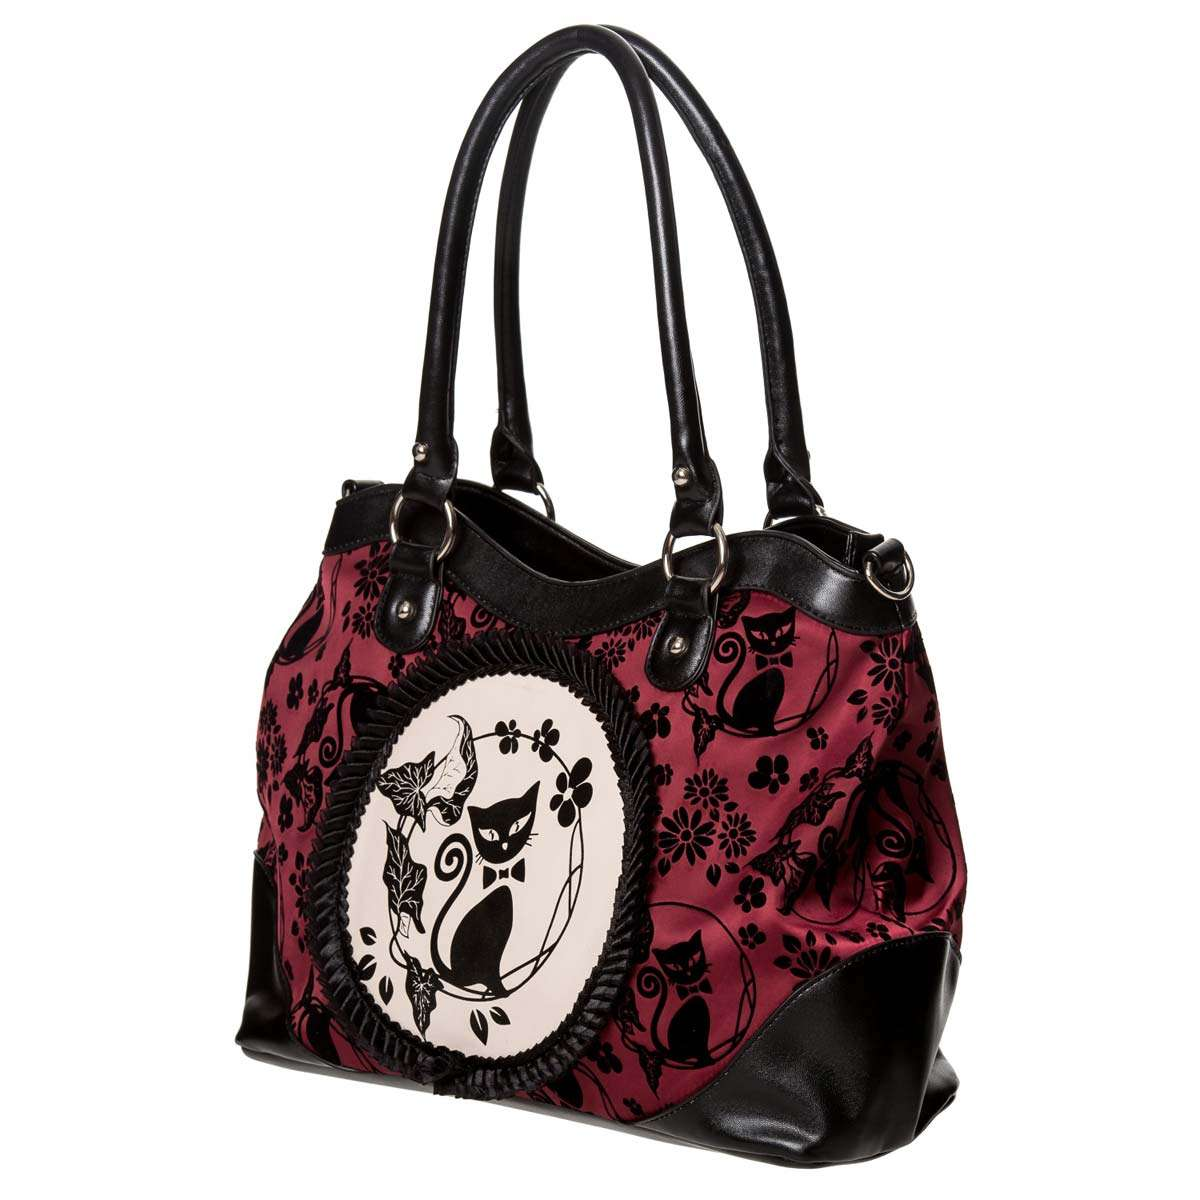 Cameo Lolita Schwarz Bordeaux Cat Gothic Handtasche TK3ulFc51J